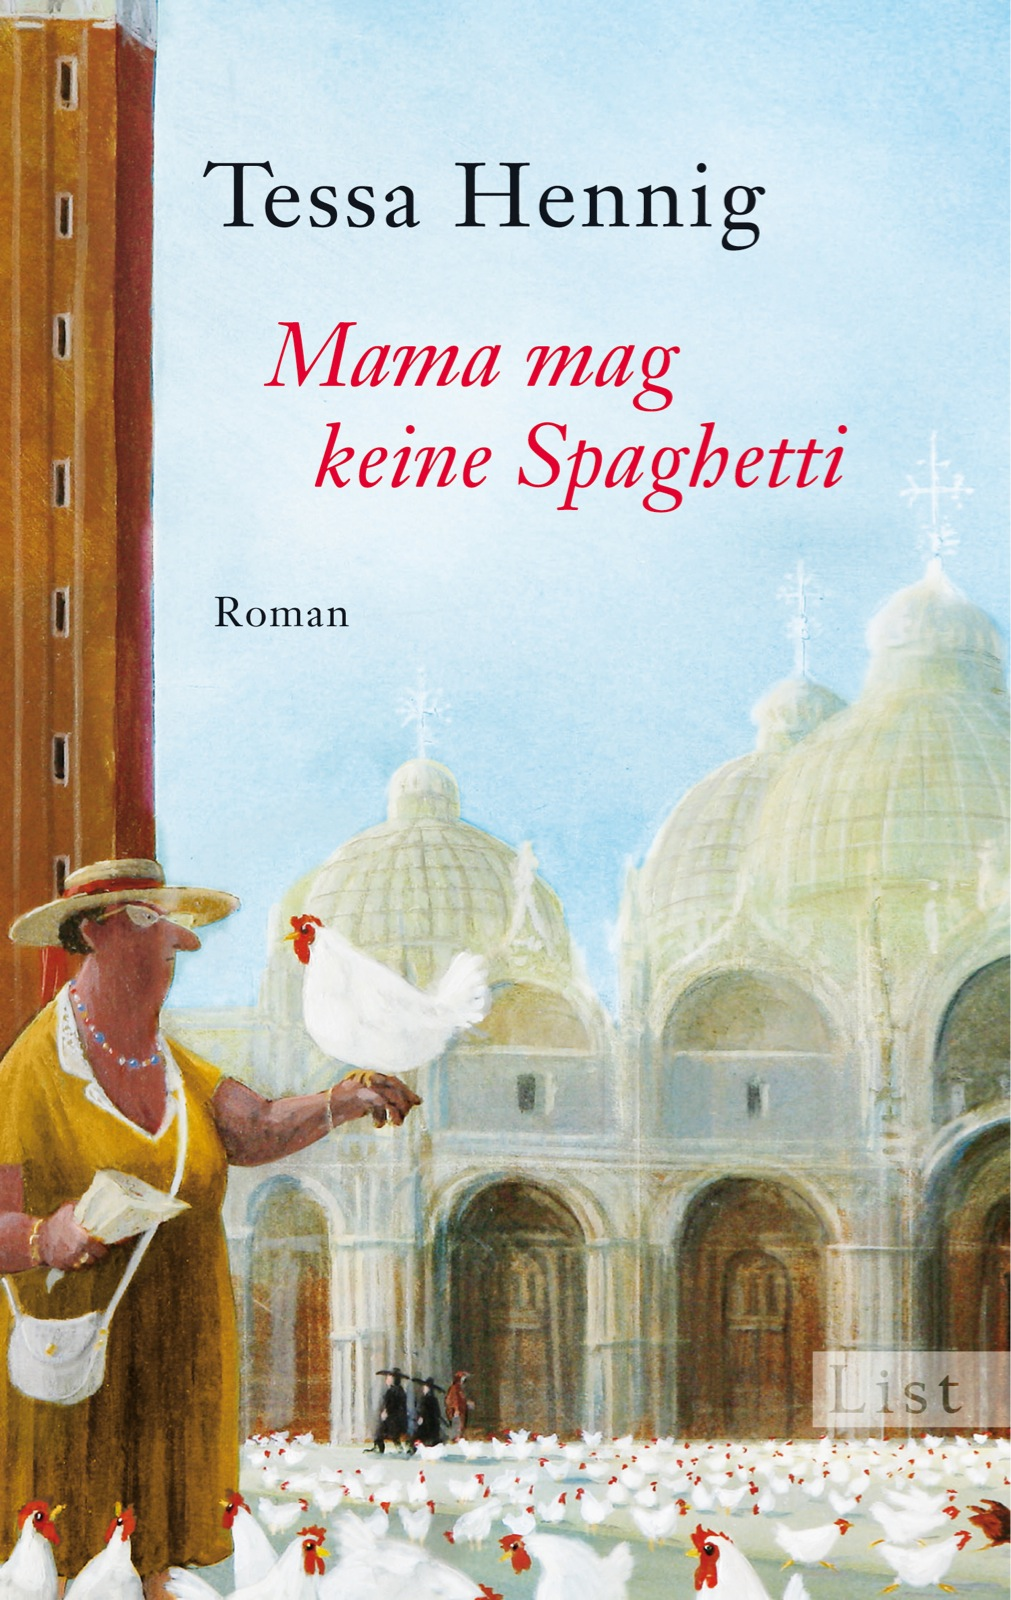 Mama mag keine Spaghetti - Tessa Hennig